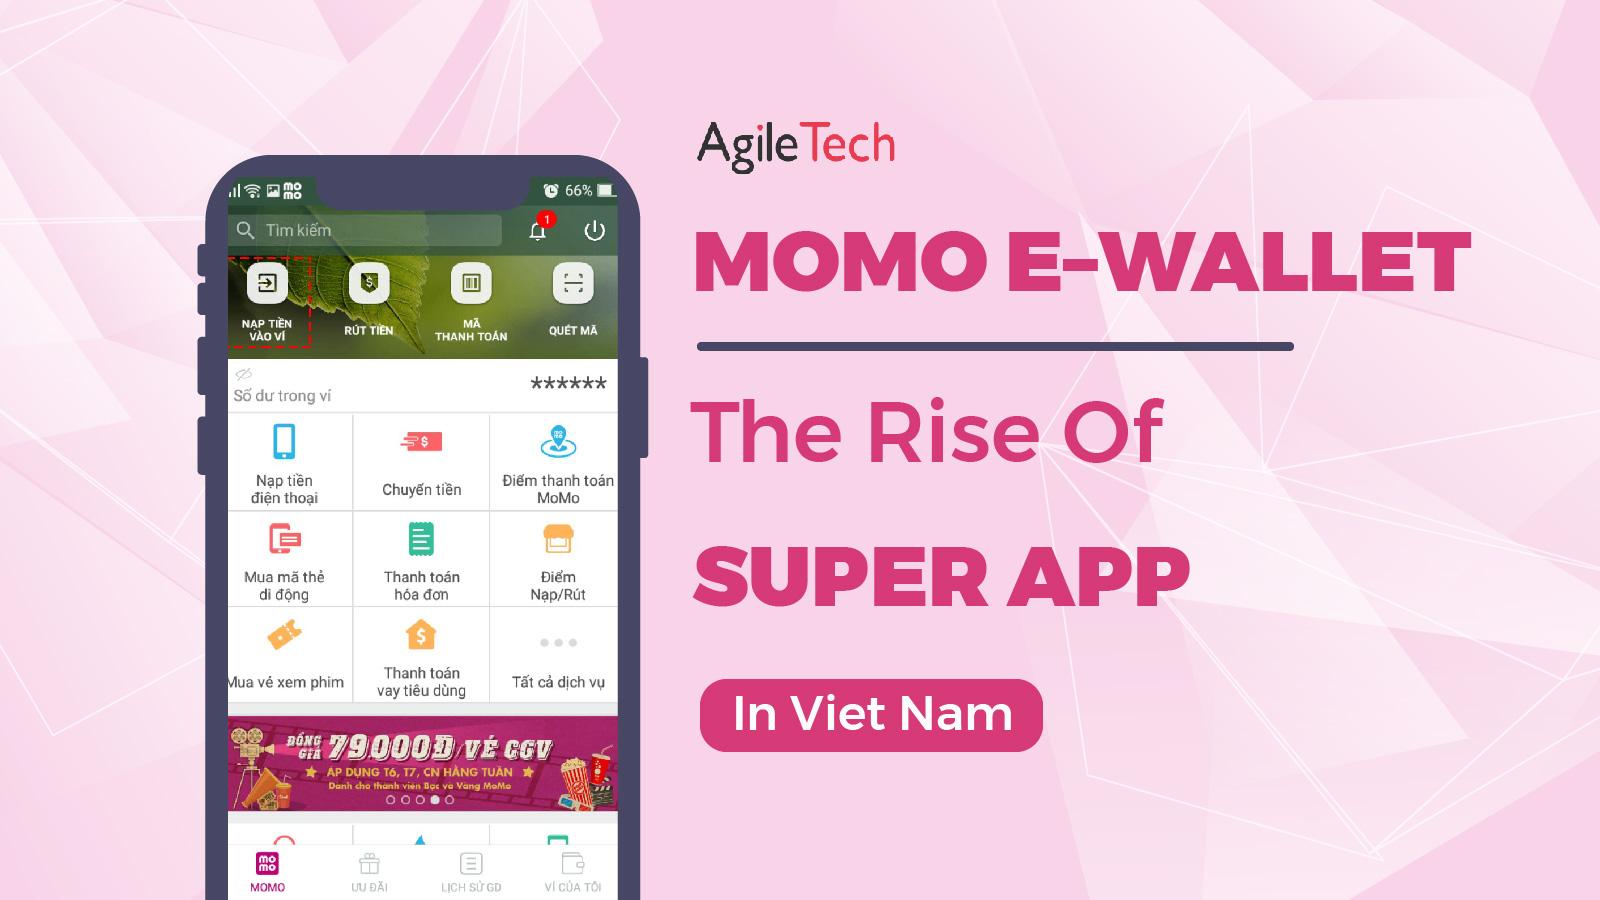 momo e wallet the rise of super app in Vietnam super wallet